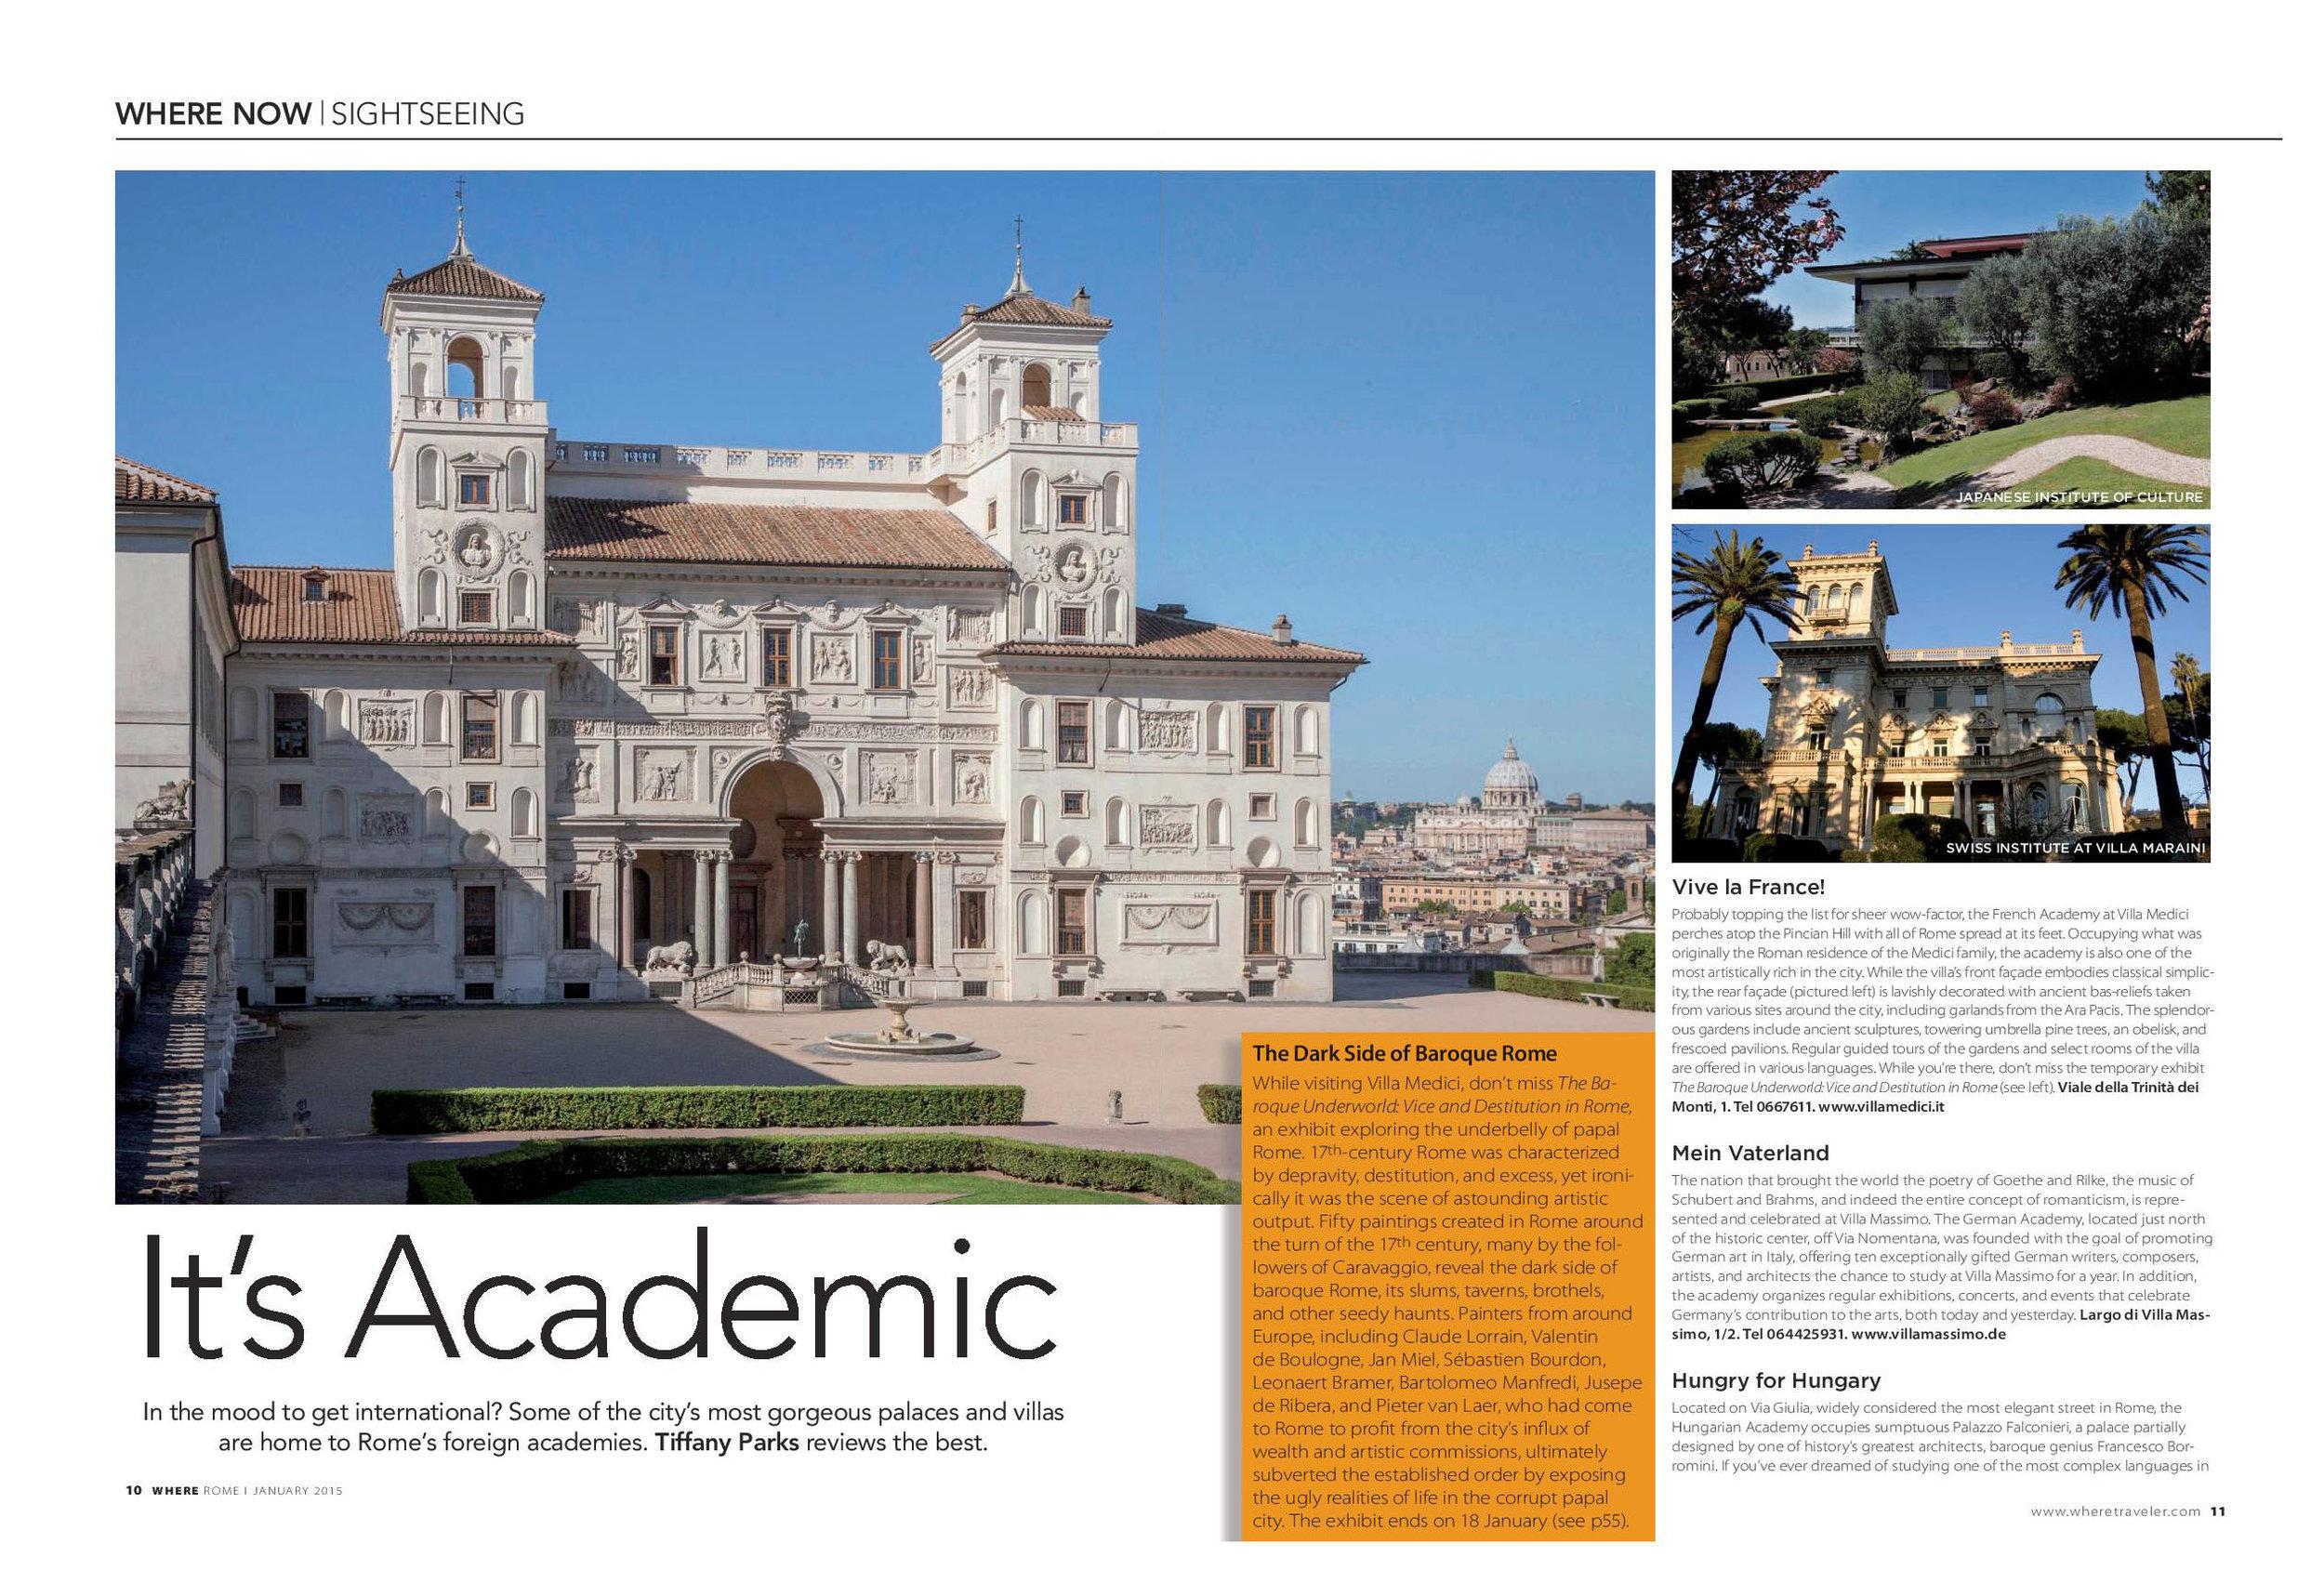 Its-Academic-Where-Rome-doublepage.jpg